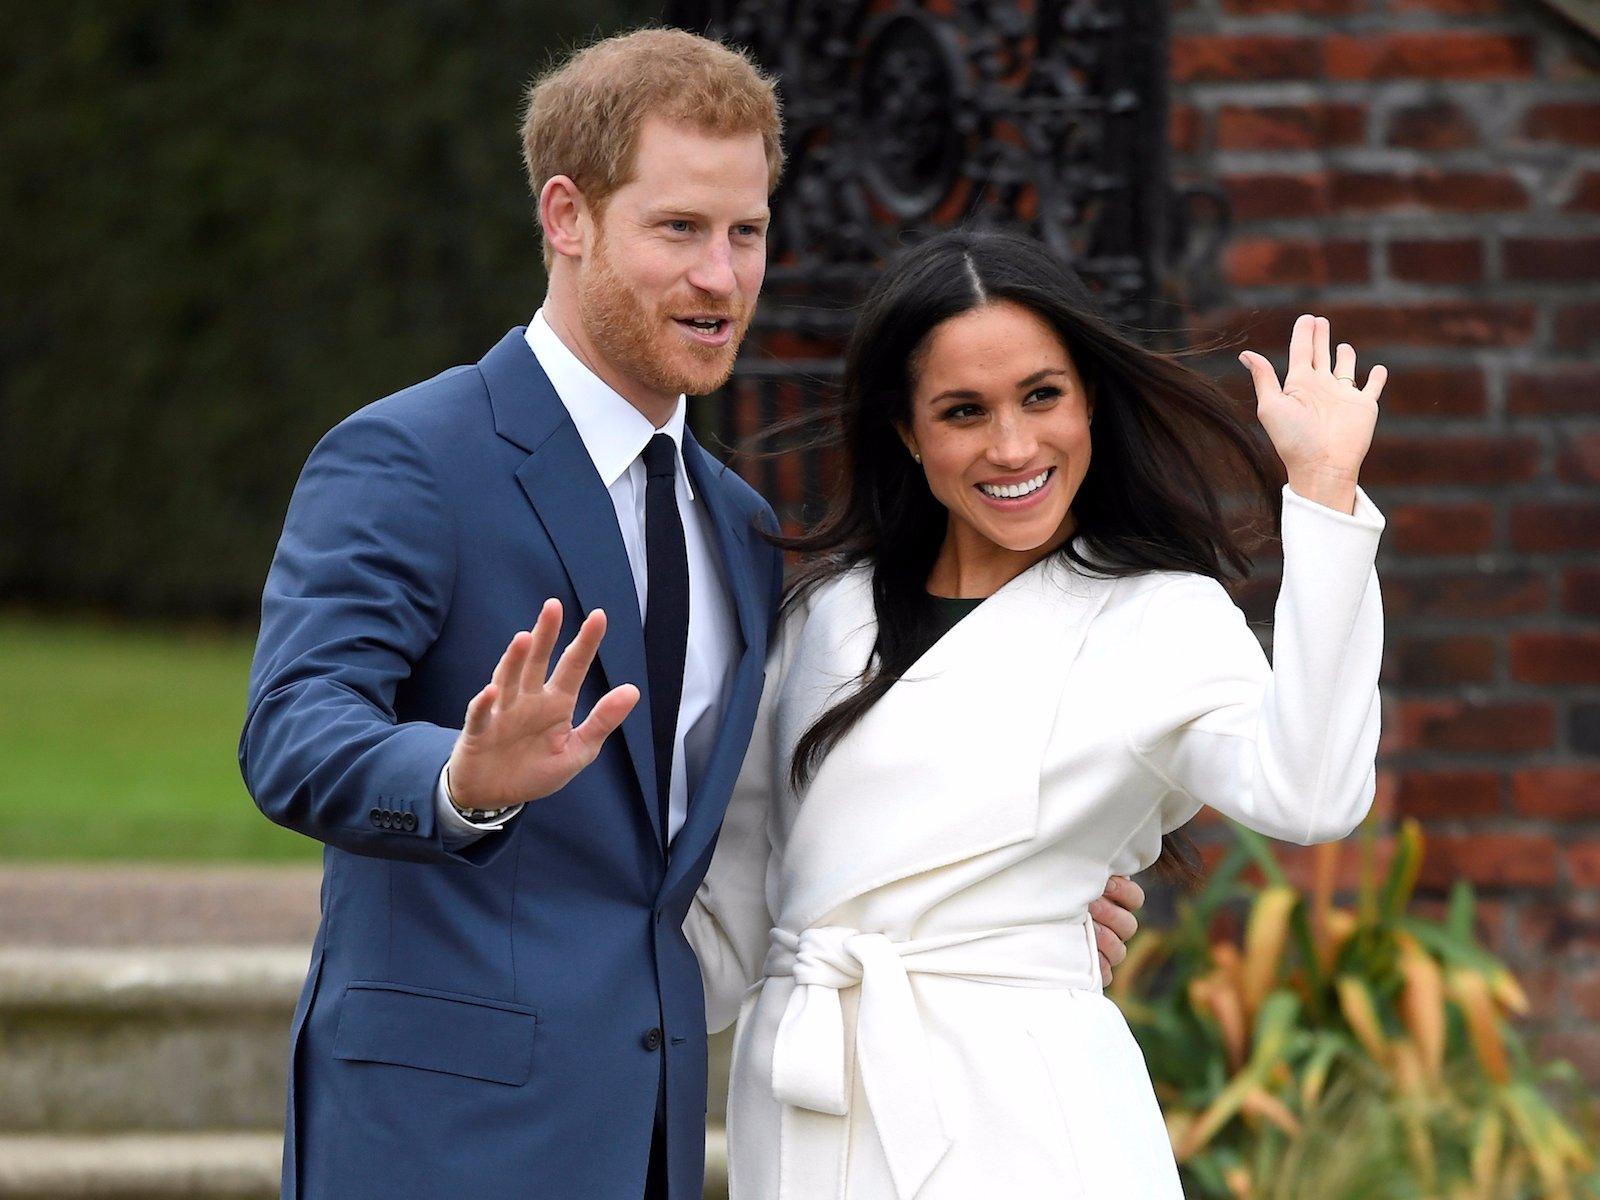 Принц Гарри и его супруга Меган Маркл позируют